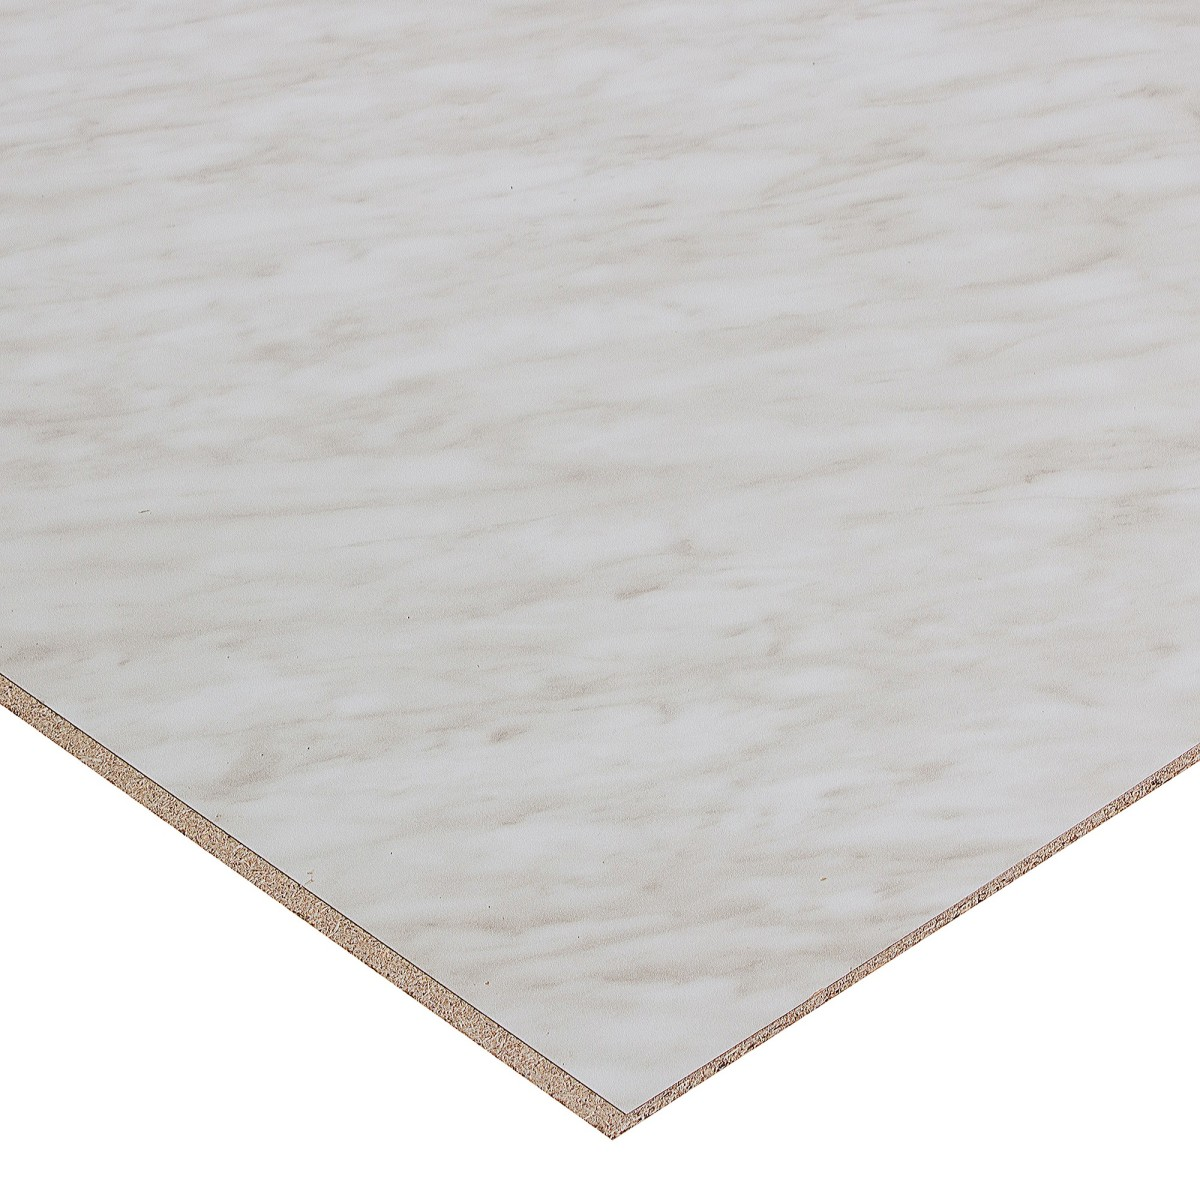 Стеновая панель №3014 60х0.6x300 см ДСП цвет мрамор каррара